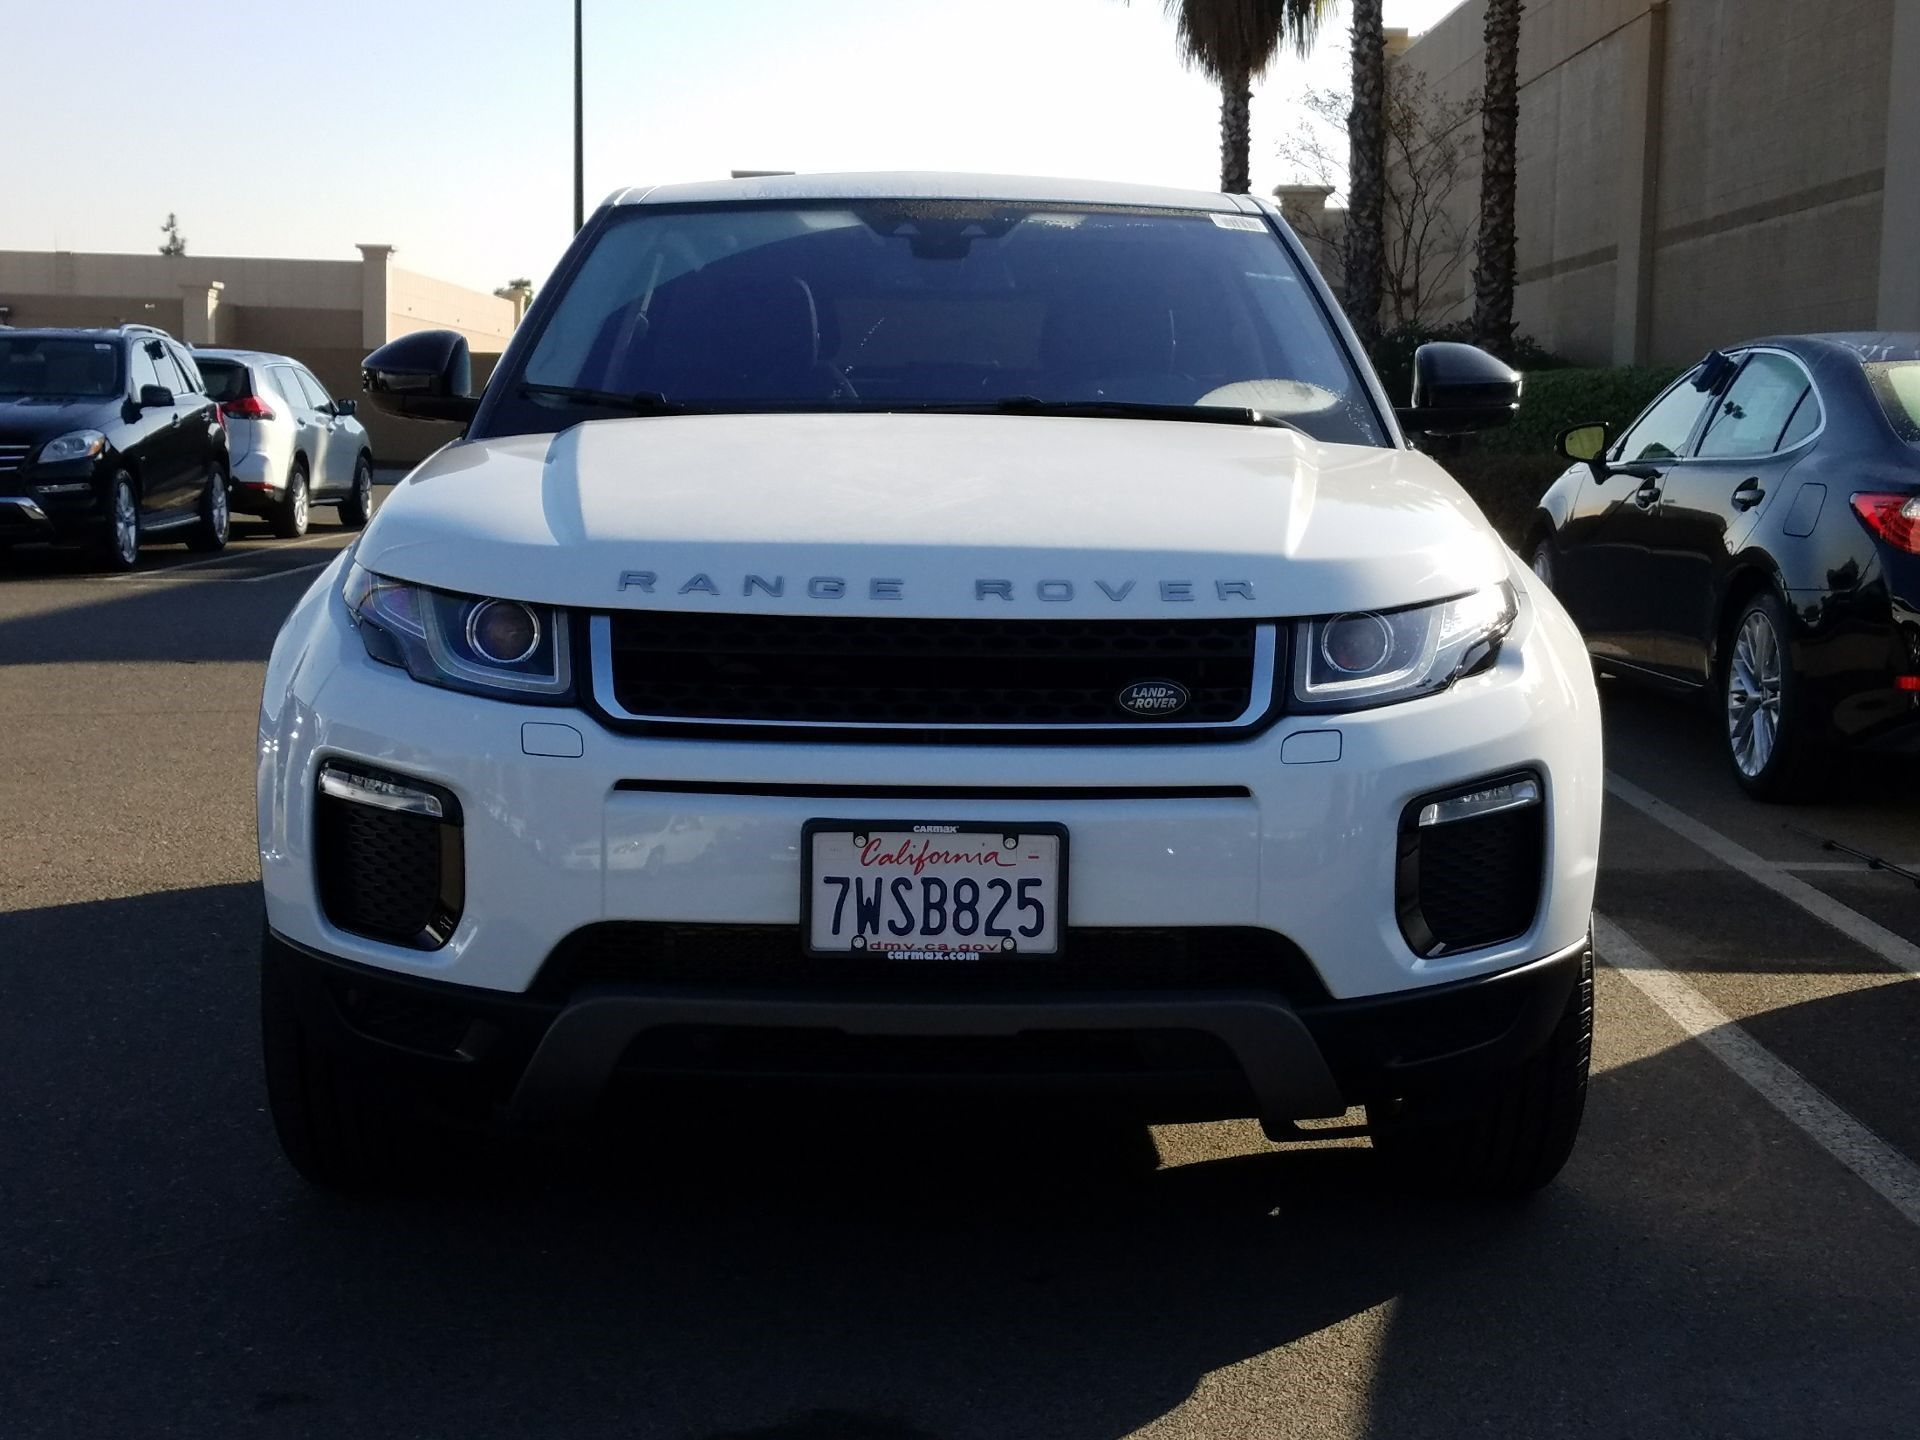 Used 2017 Land Rover Range Rover Evoque In Reno Nevada Carmax Land Rover Range Rover Evoque Range Rover